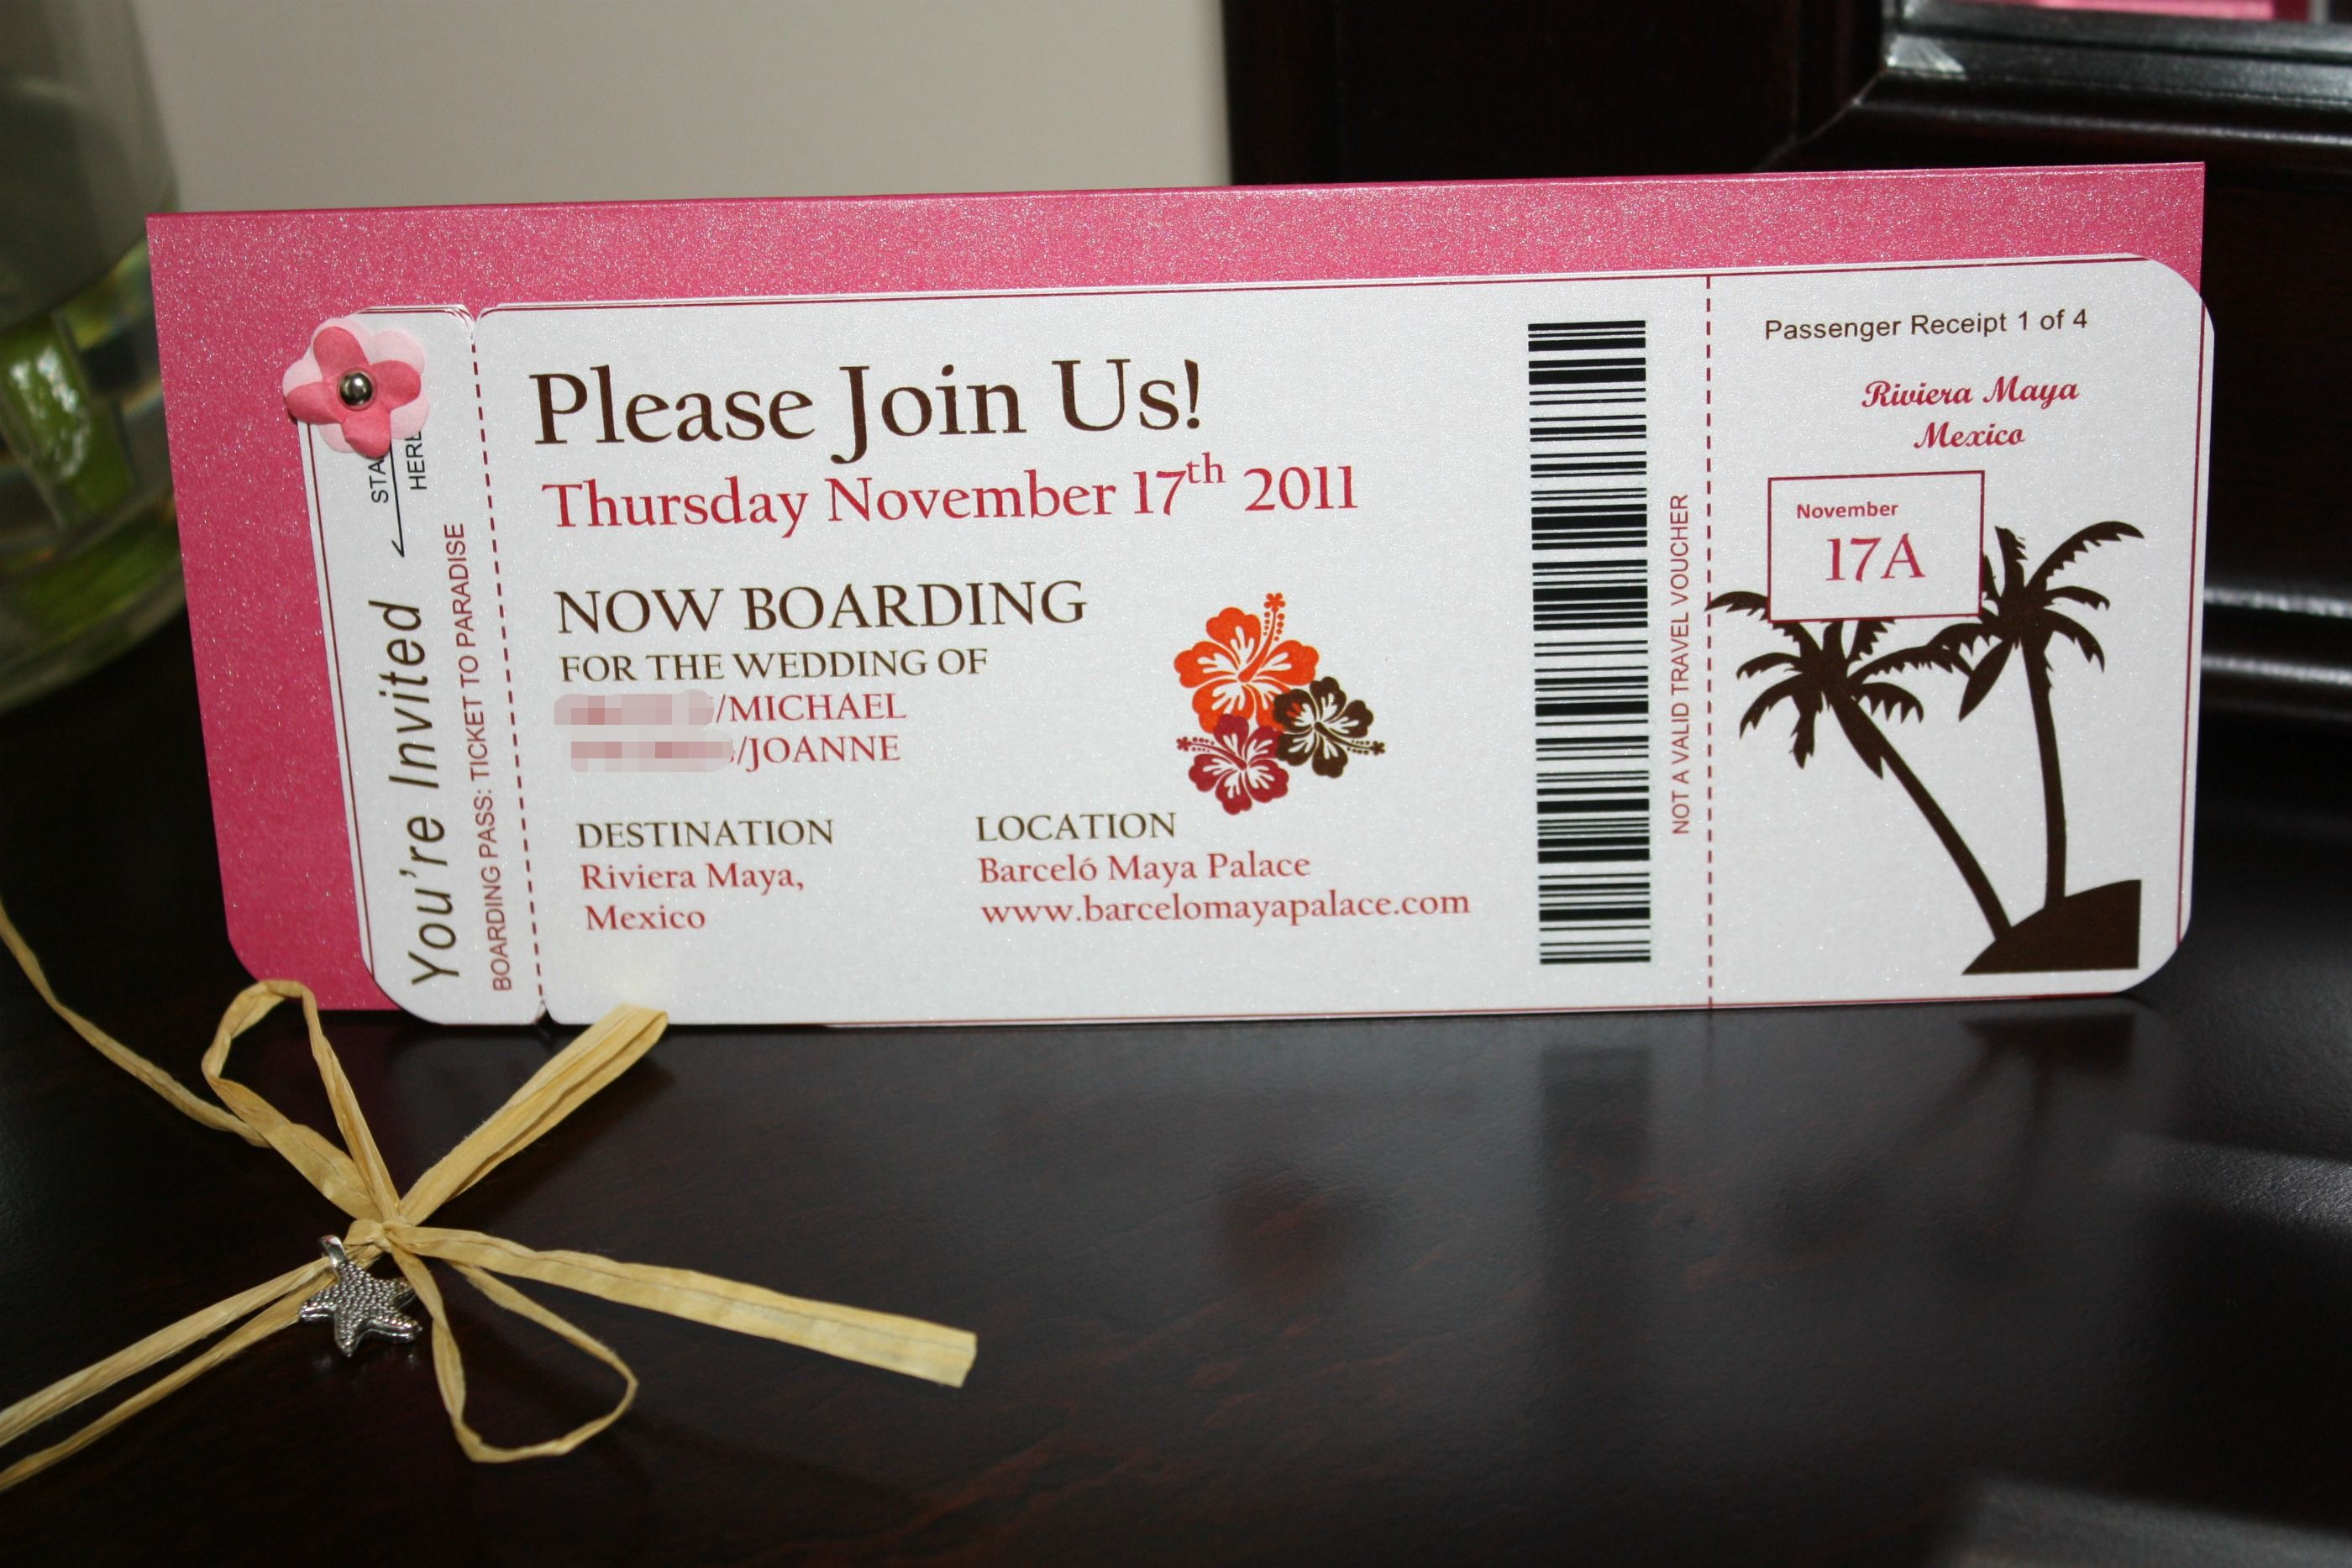 IMG_2058_1.jpg | Wedding card | Pinterest | Boarding pass invitation ...